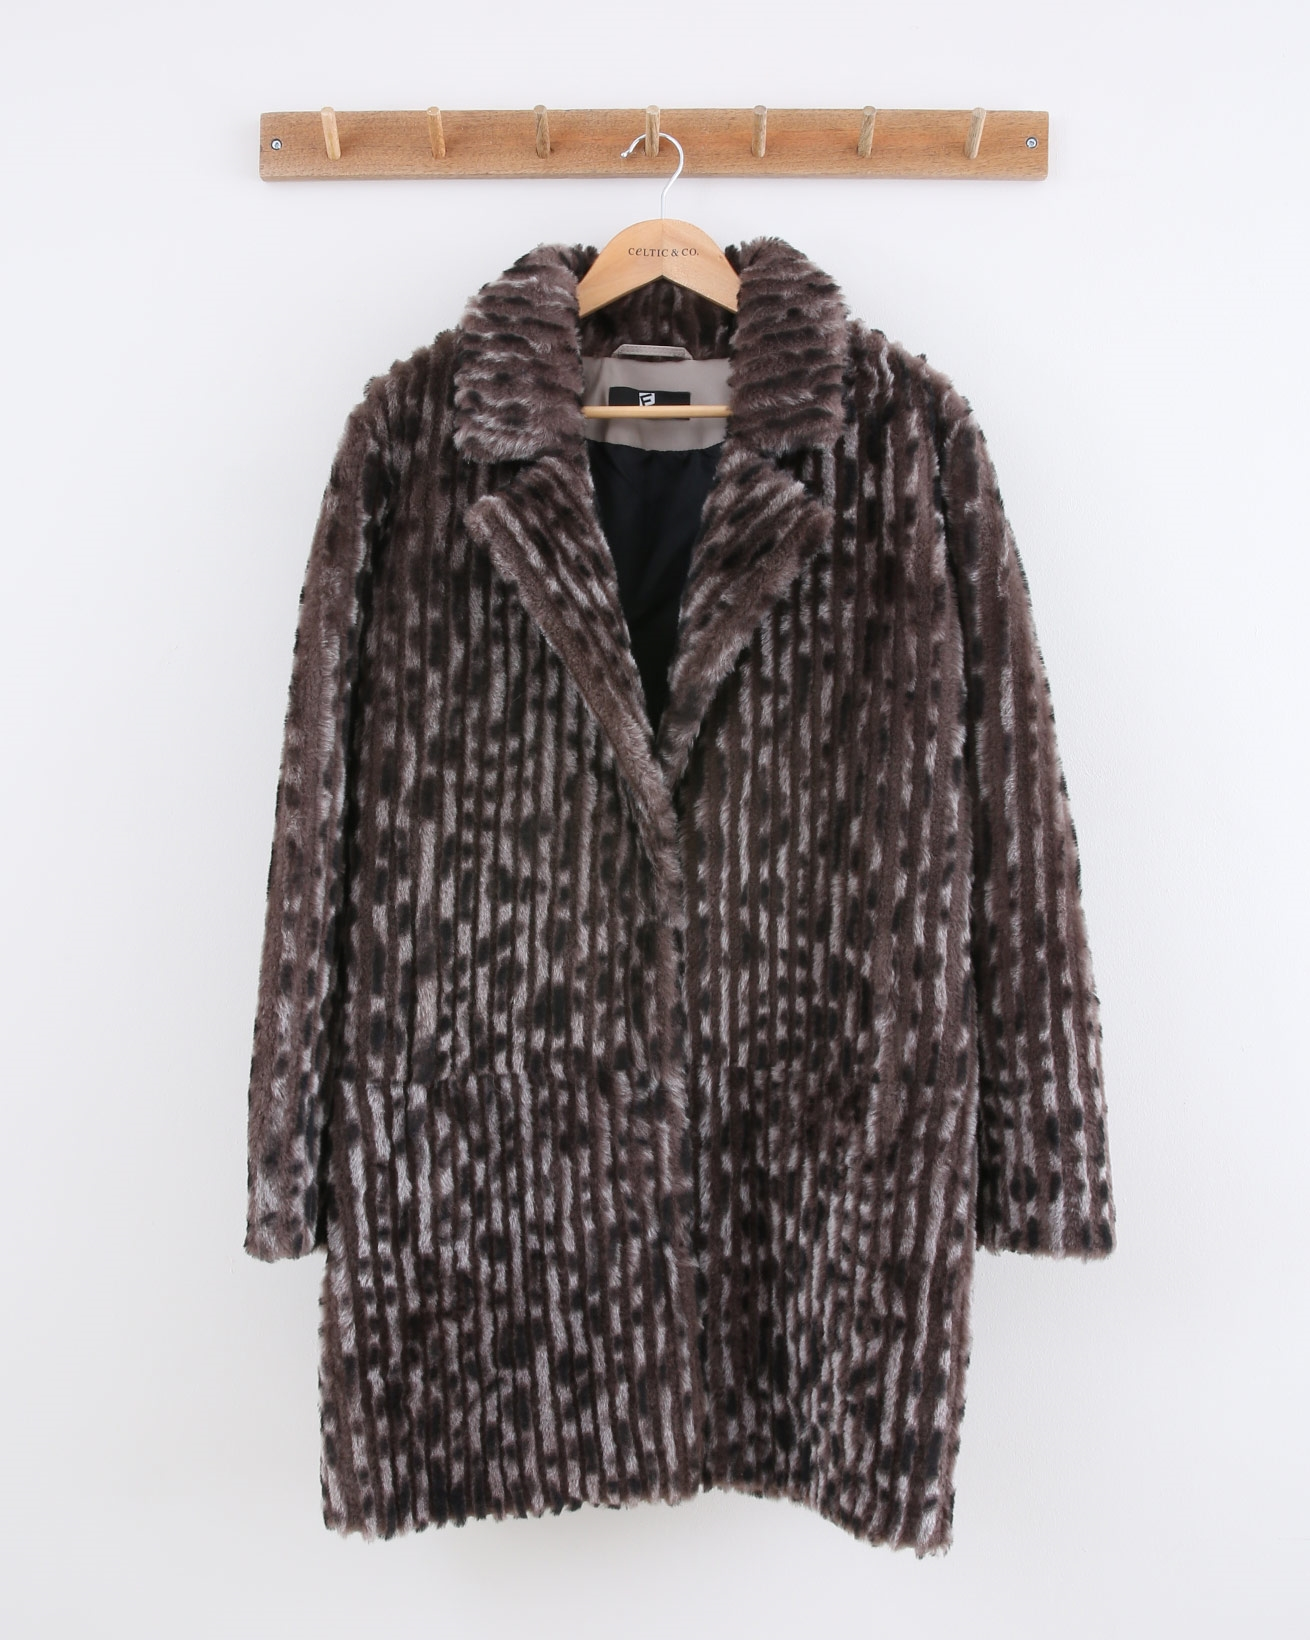 Imitation Mink Sheepskin Coat - Size 10 - Vole - 1496